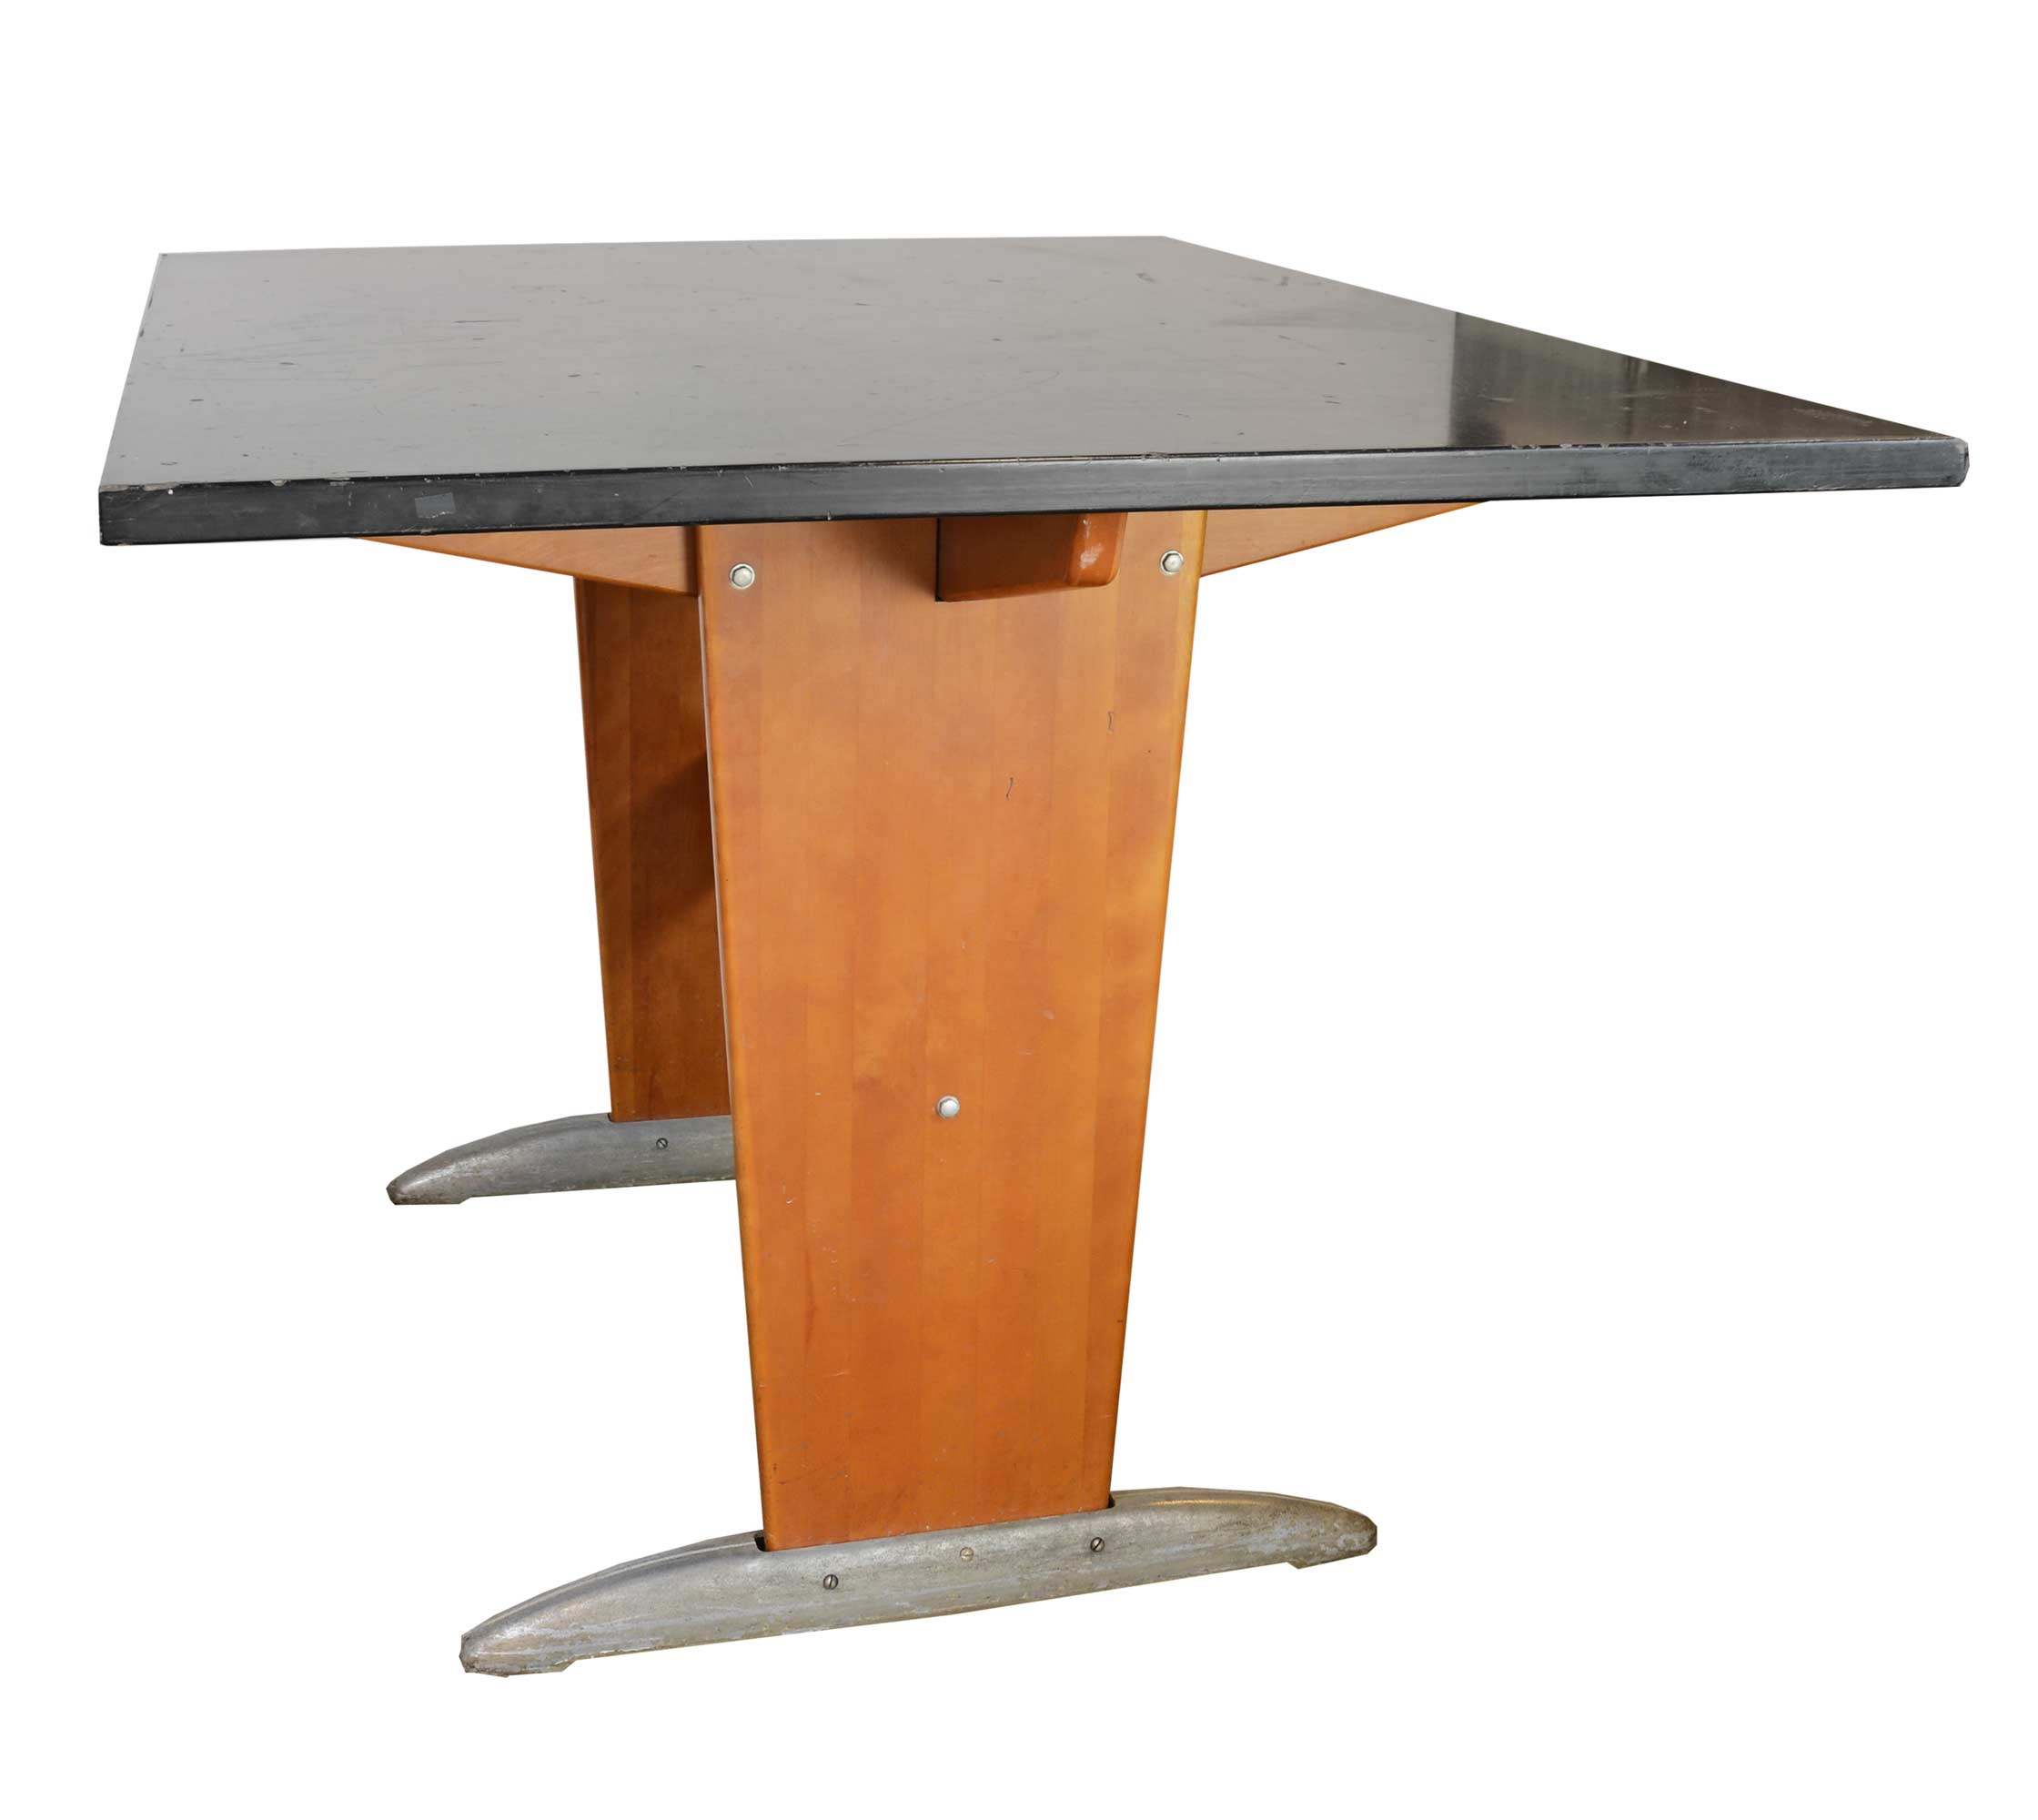 46699-lab-table-side.jpg